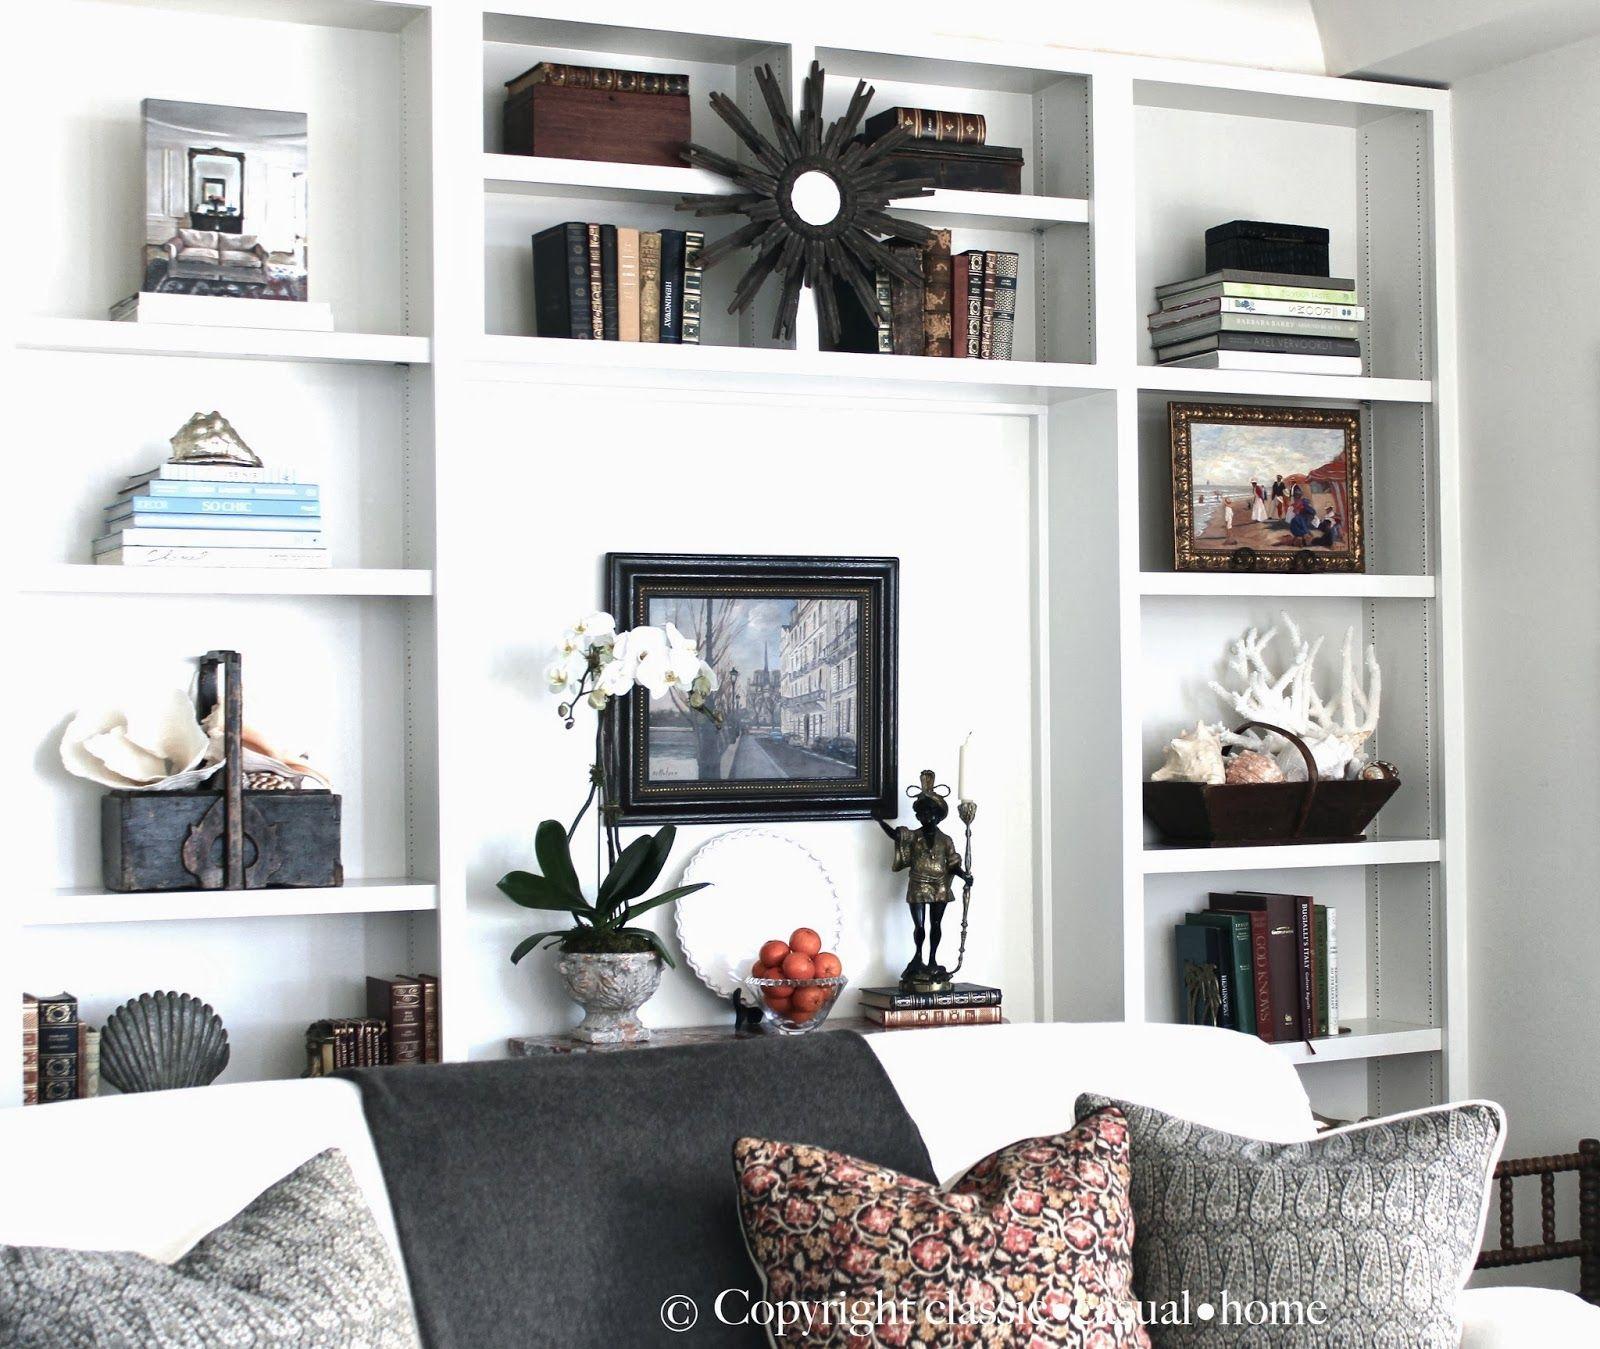 Our Living Room Shelves | Shelves, Living rooms and Shelving decor